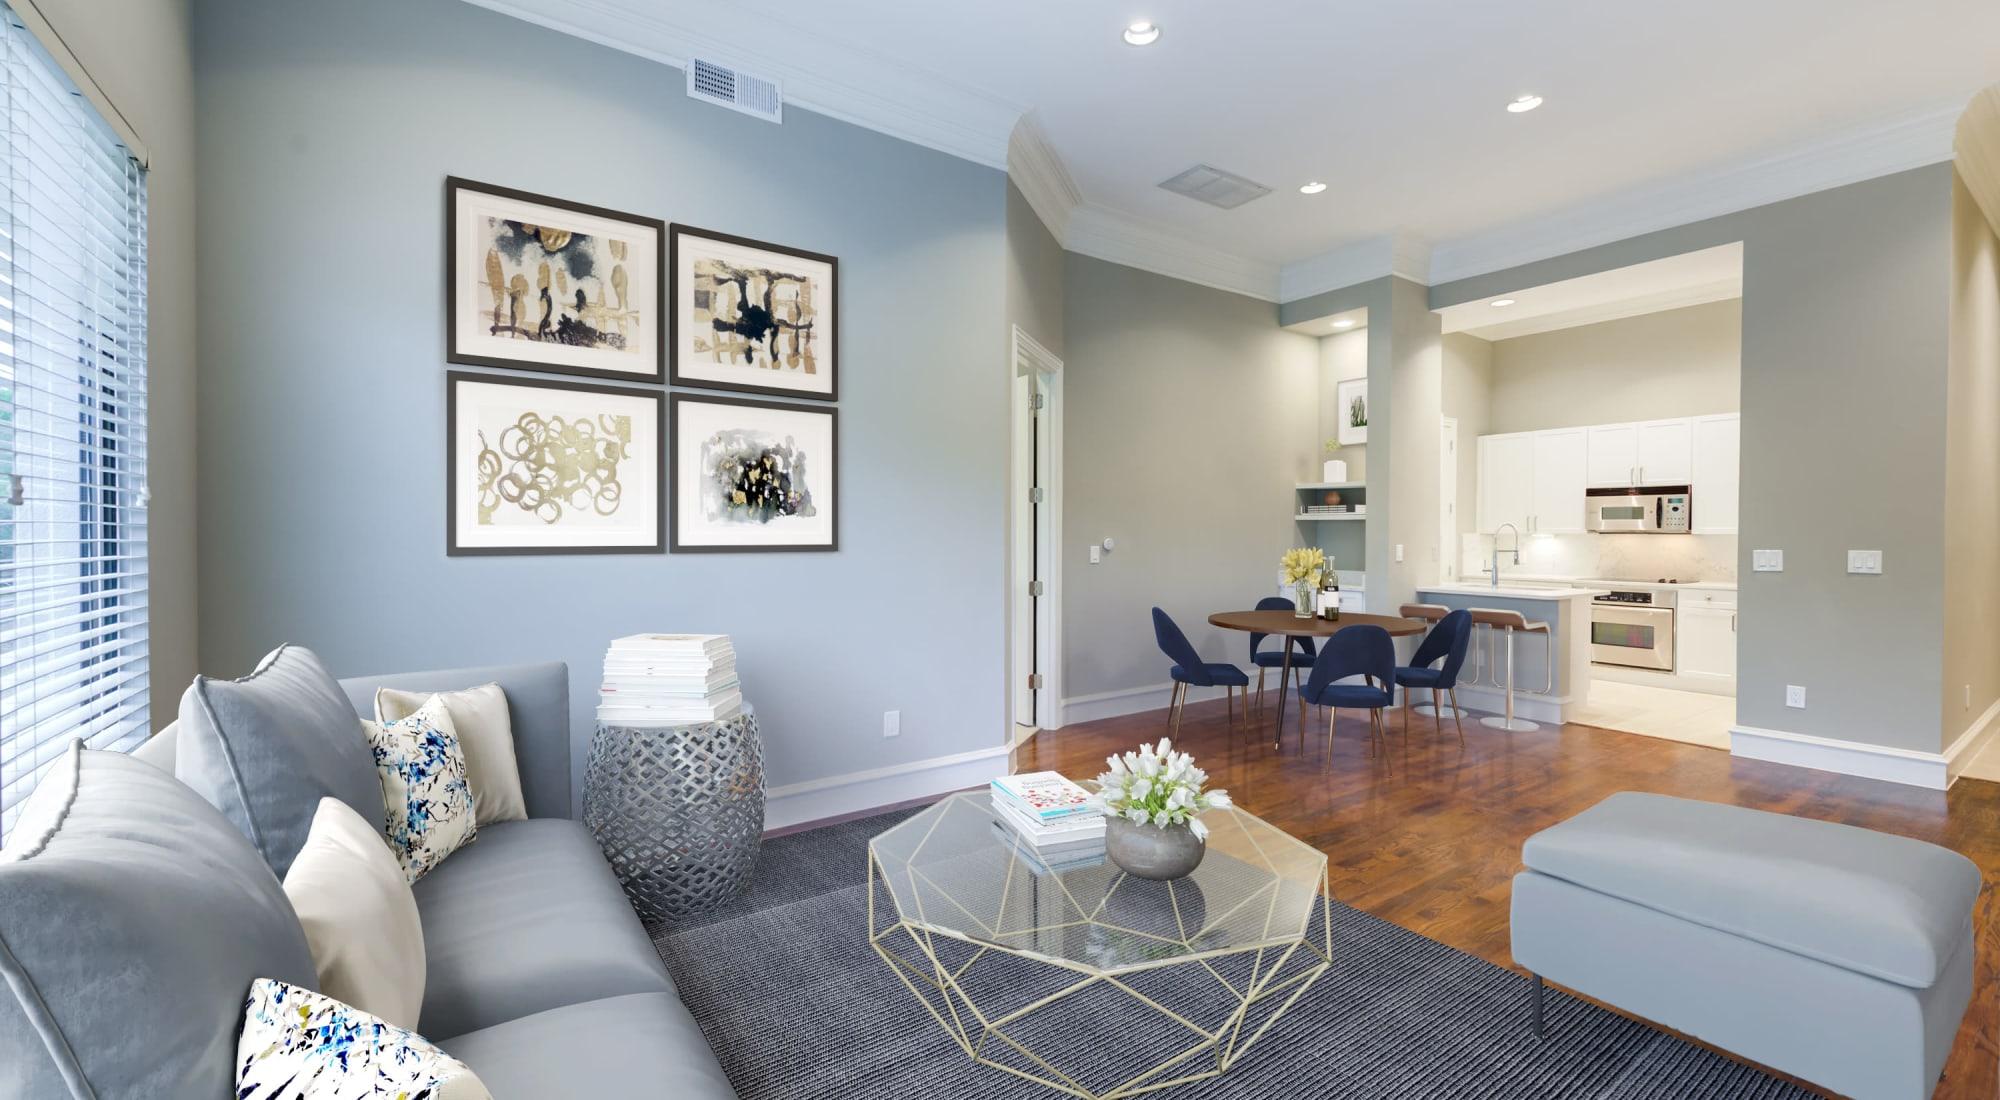 Interior living room of unit at Rienzi at Turtle Creek Apartments